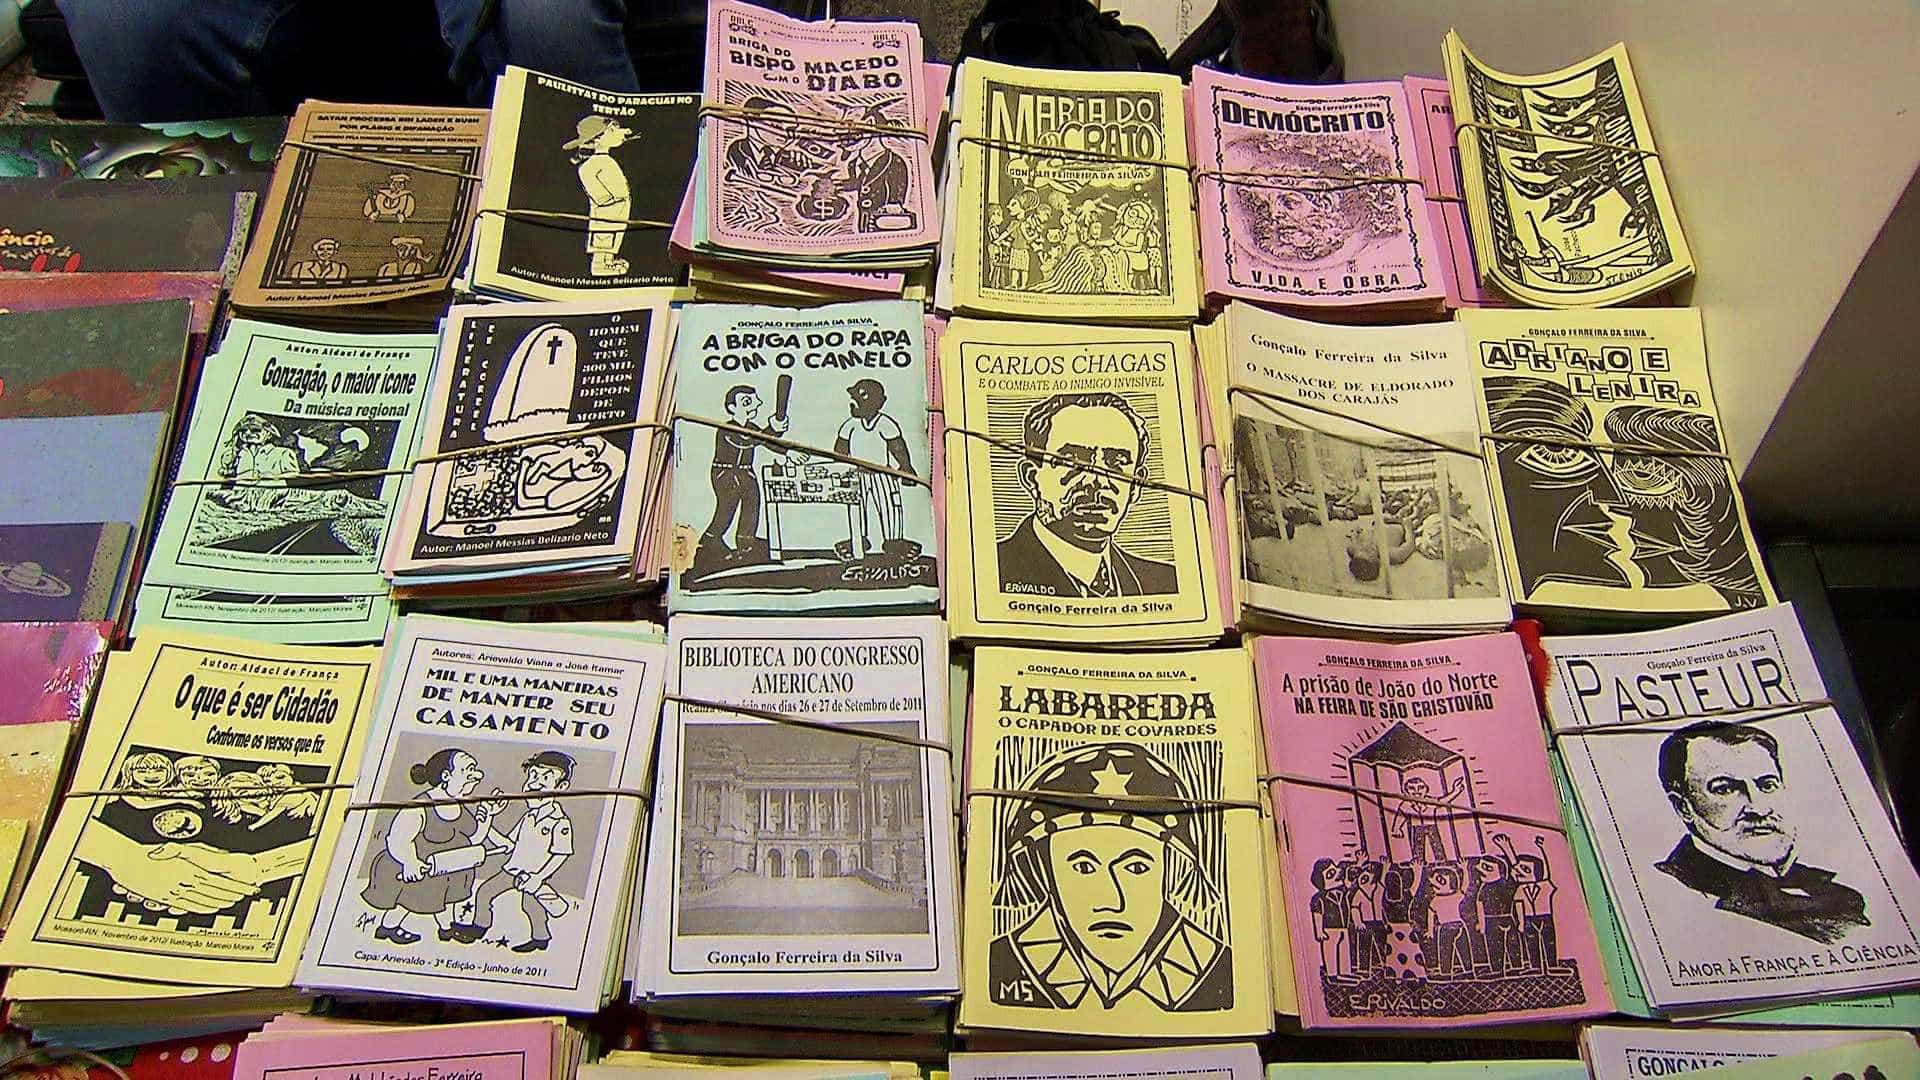 Literatura de cordel vira patrimônio cultural do Brasil